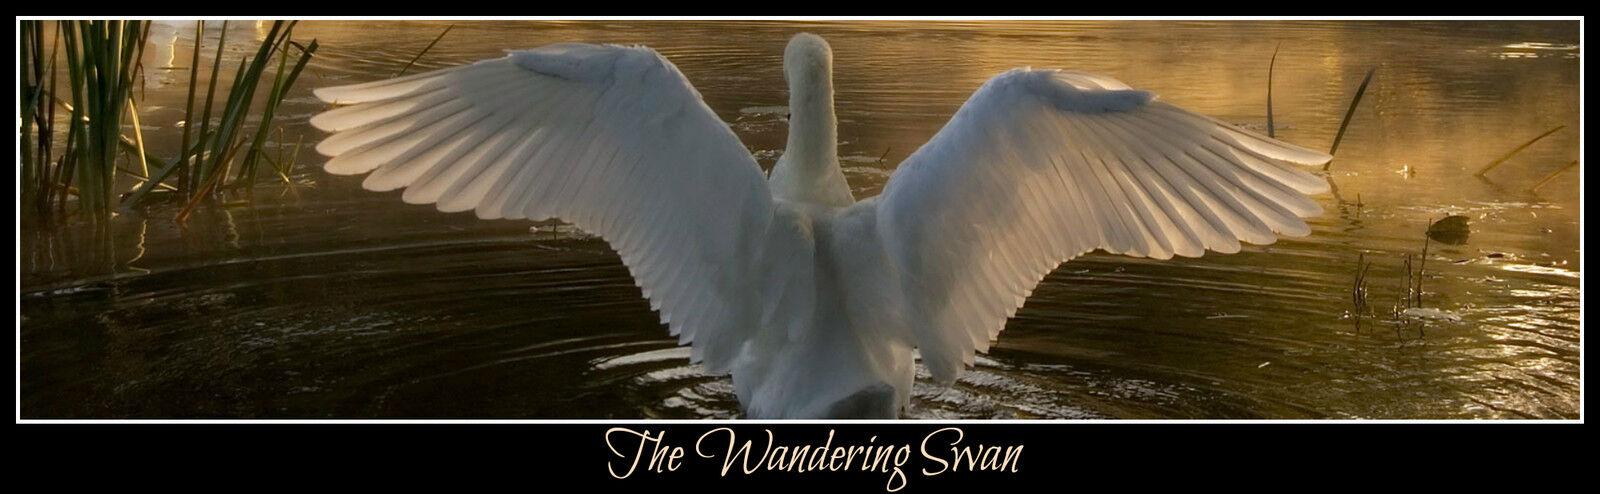 The Wandering Swan